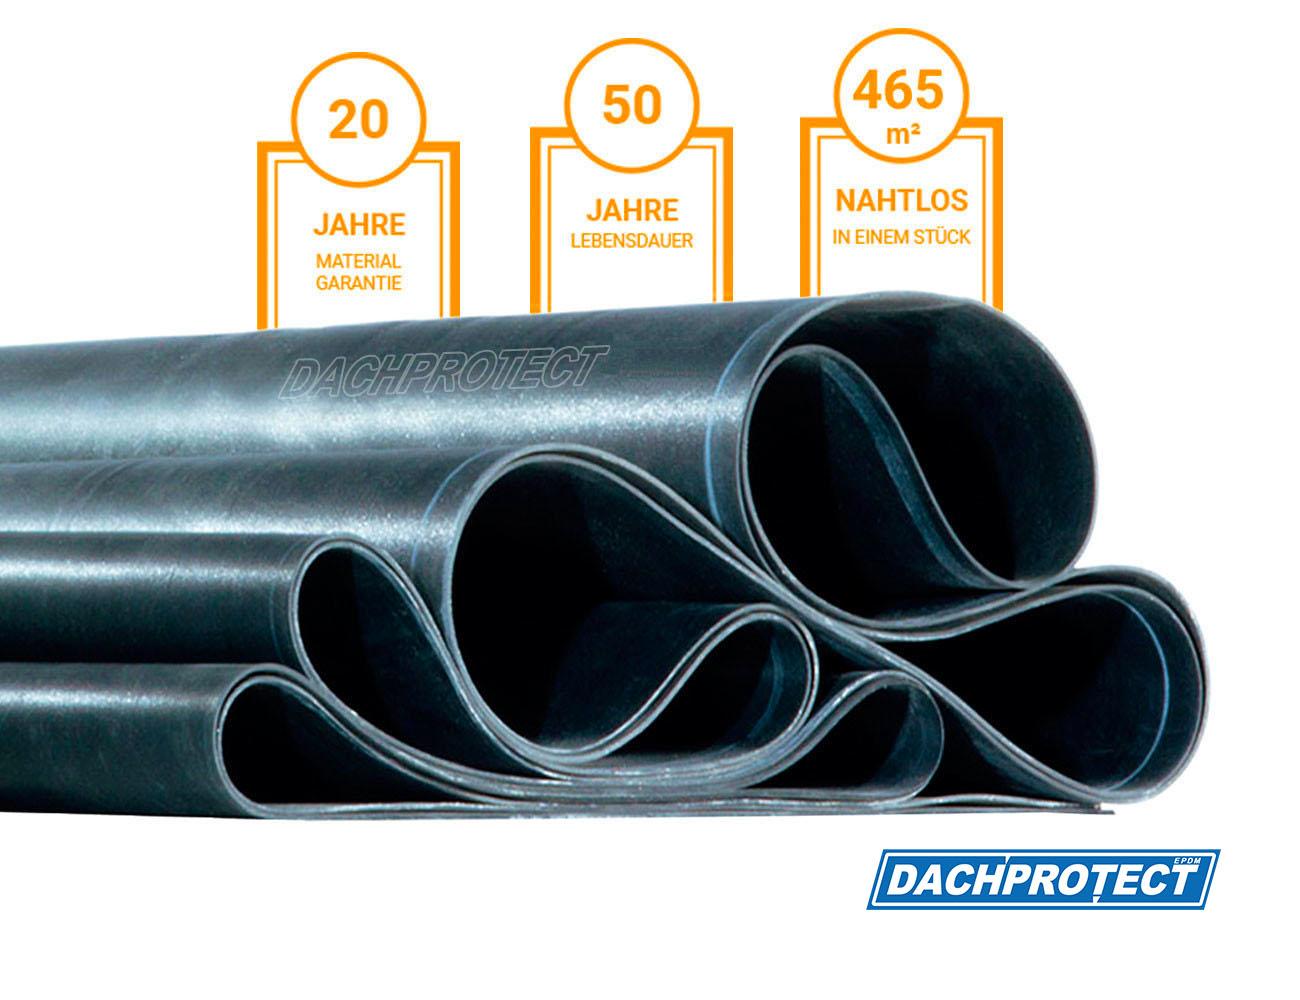 Breite 4,00 m EPDM Dachfolie Material EPDM St/ärke 1,3 mm L/änge 4,50 m